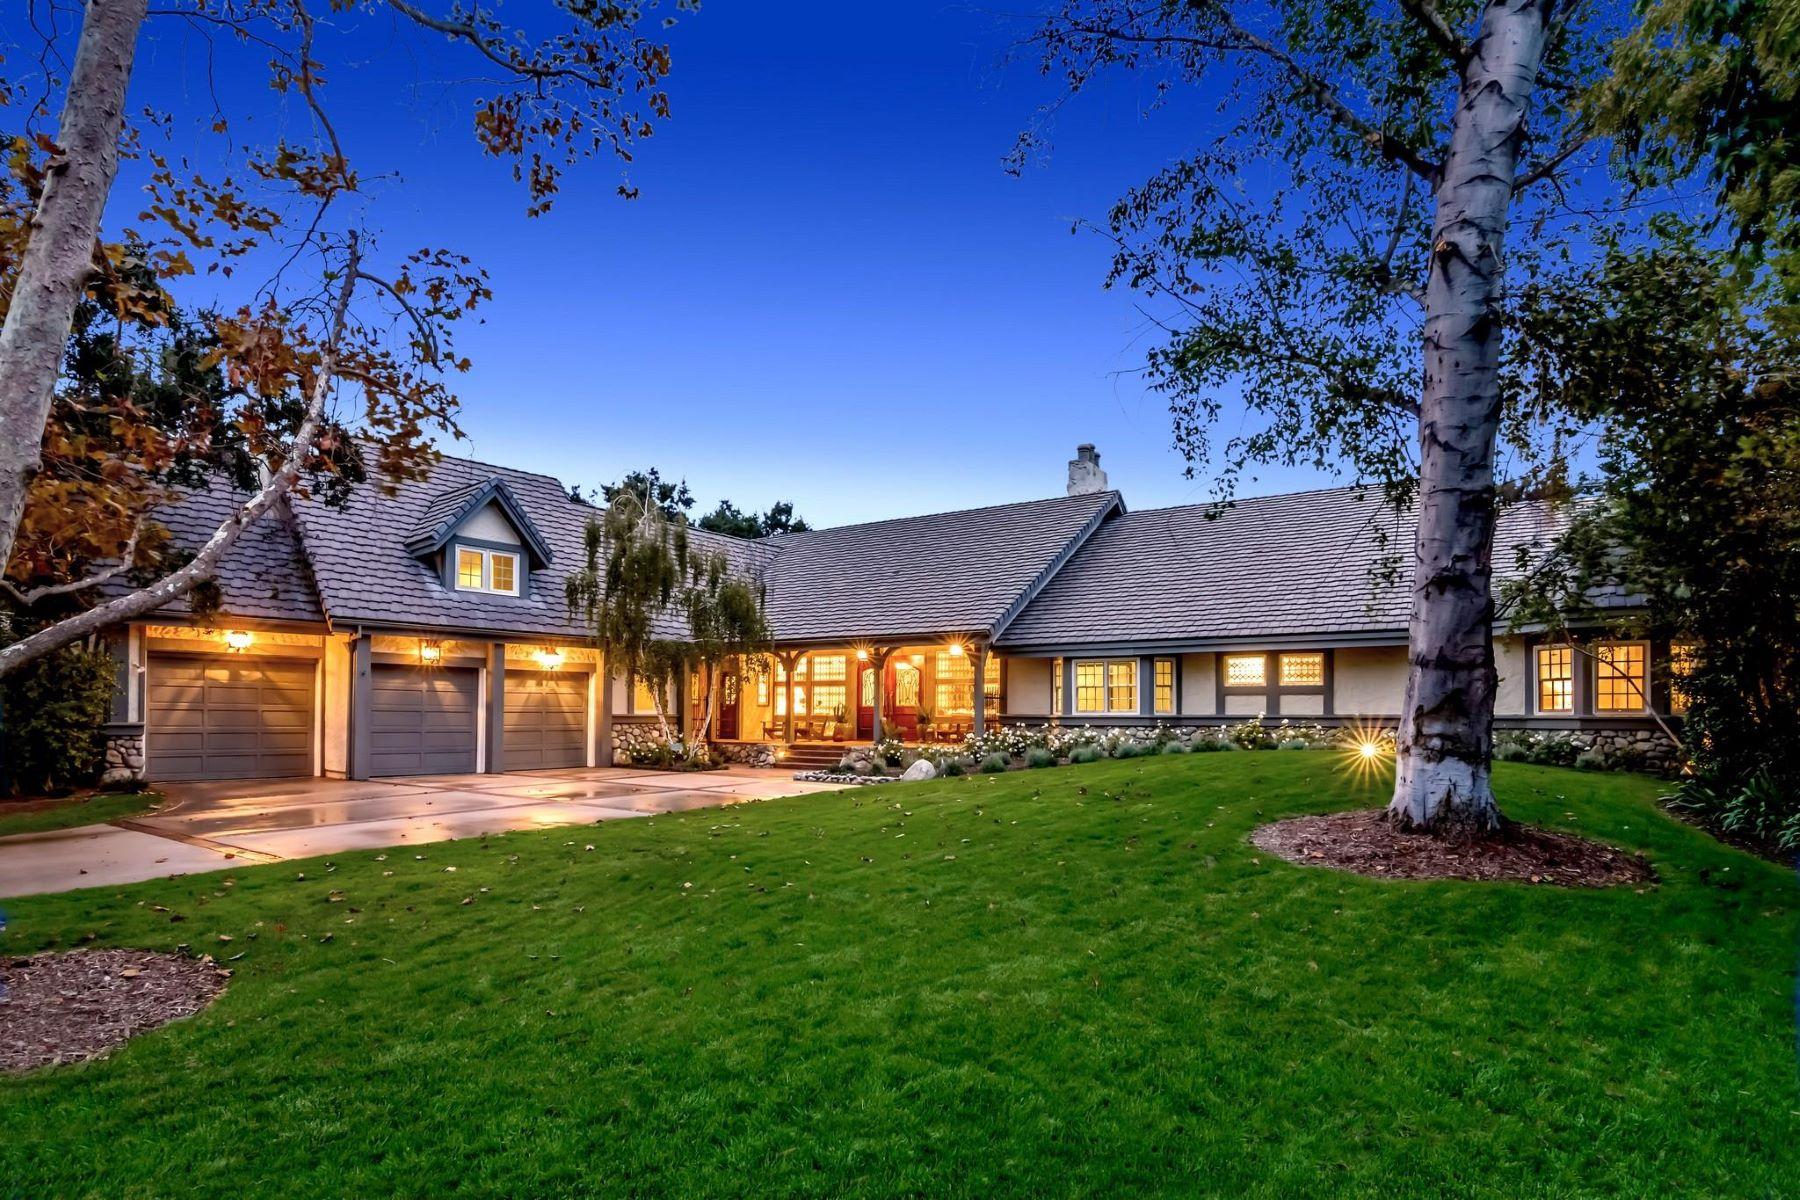 Single Family Home for Sale at 4391 Golf Course Dr, Westlake Village Ca Westlake Village, California 91362 United States